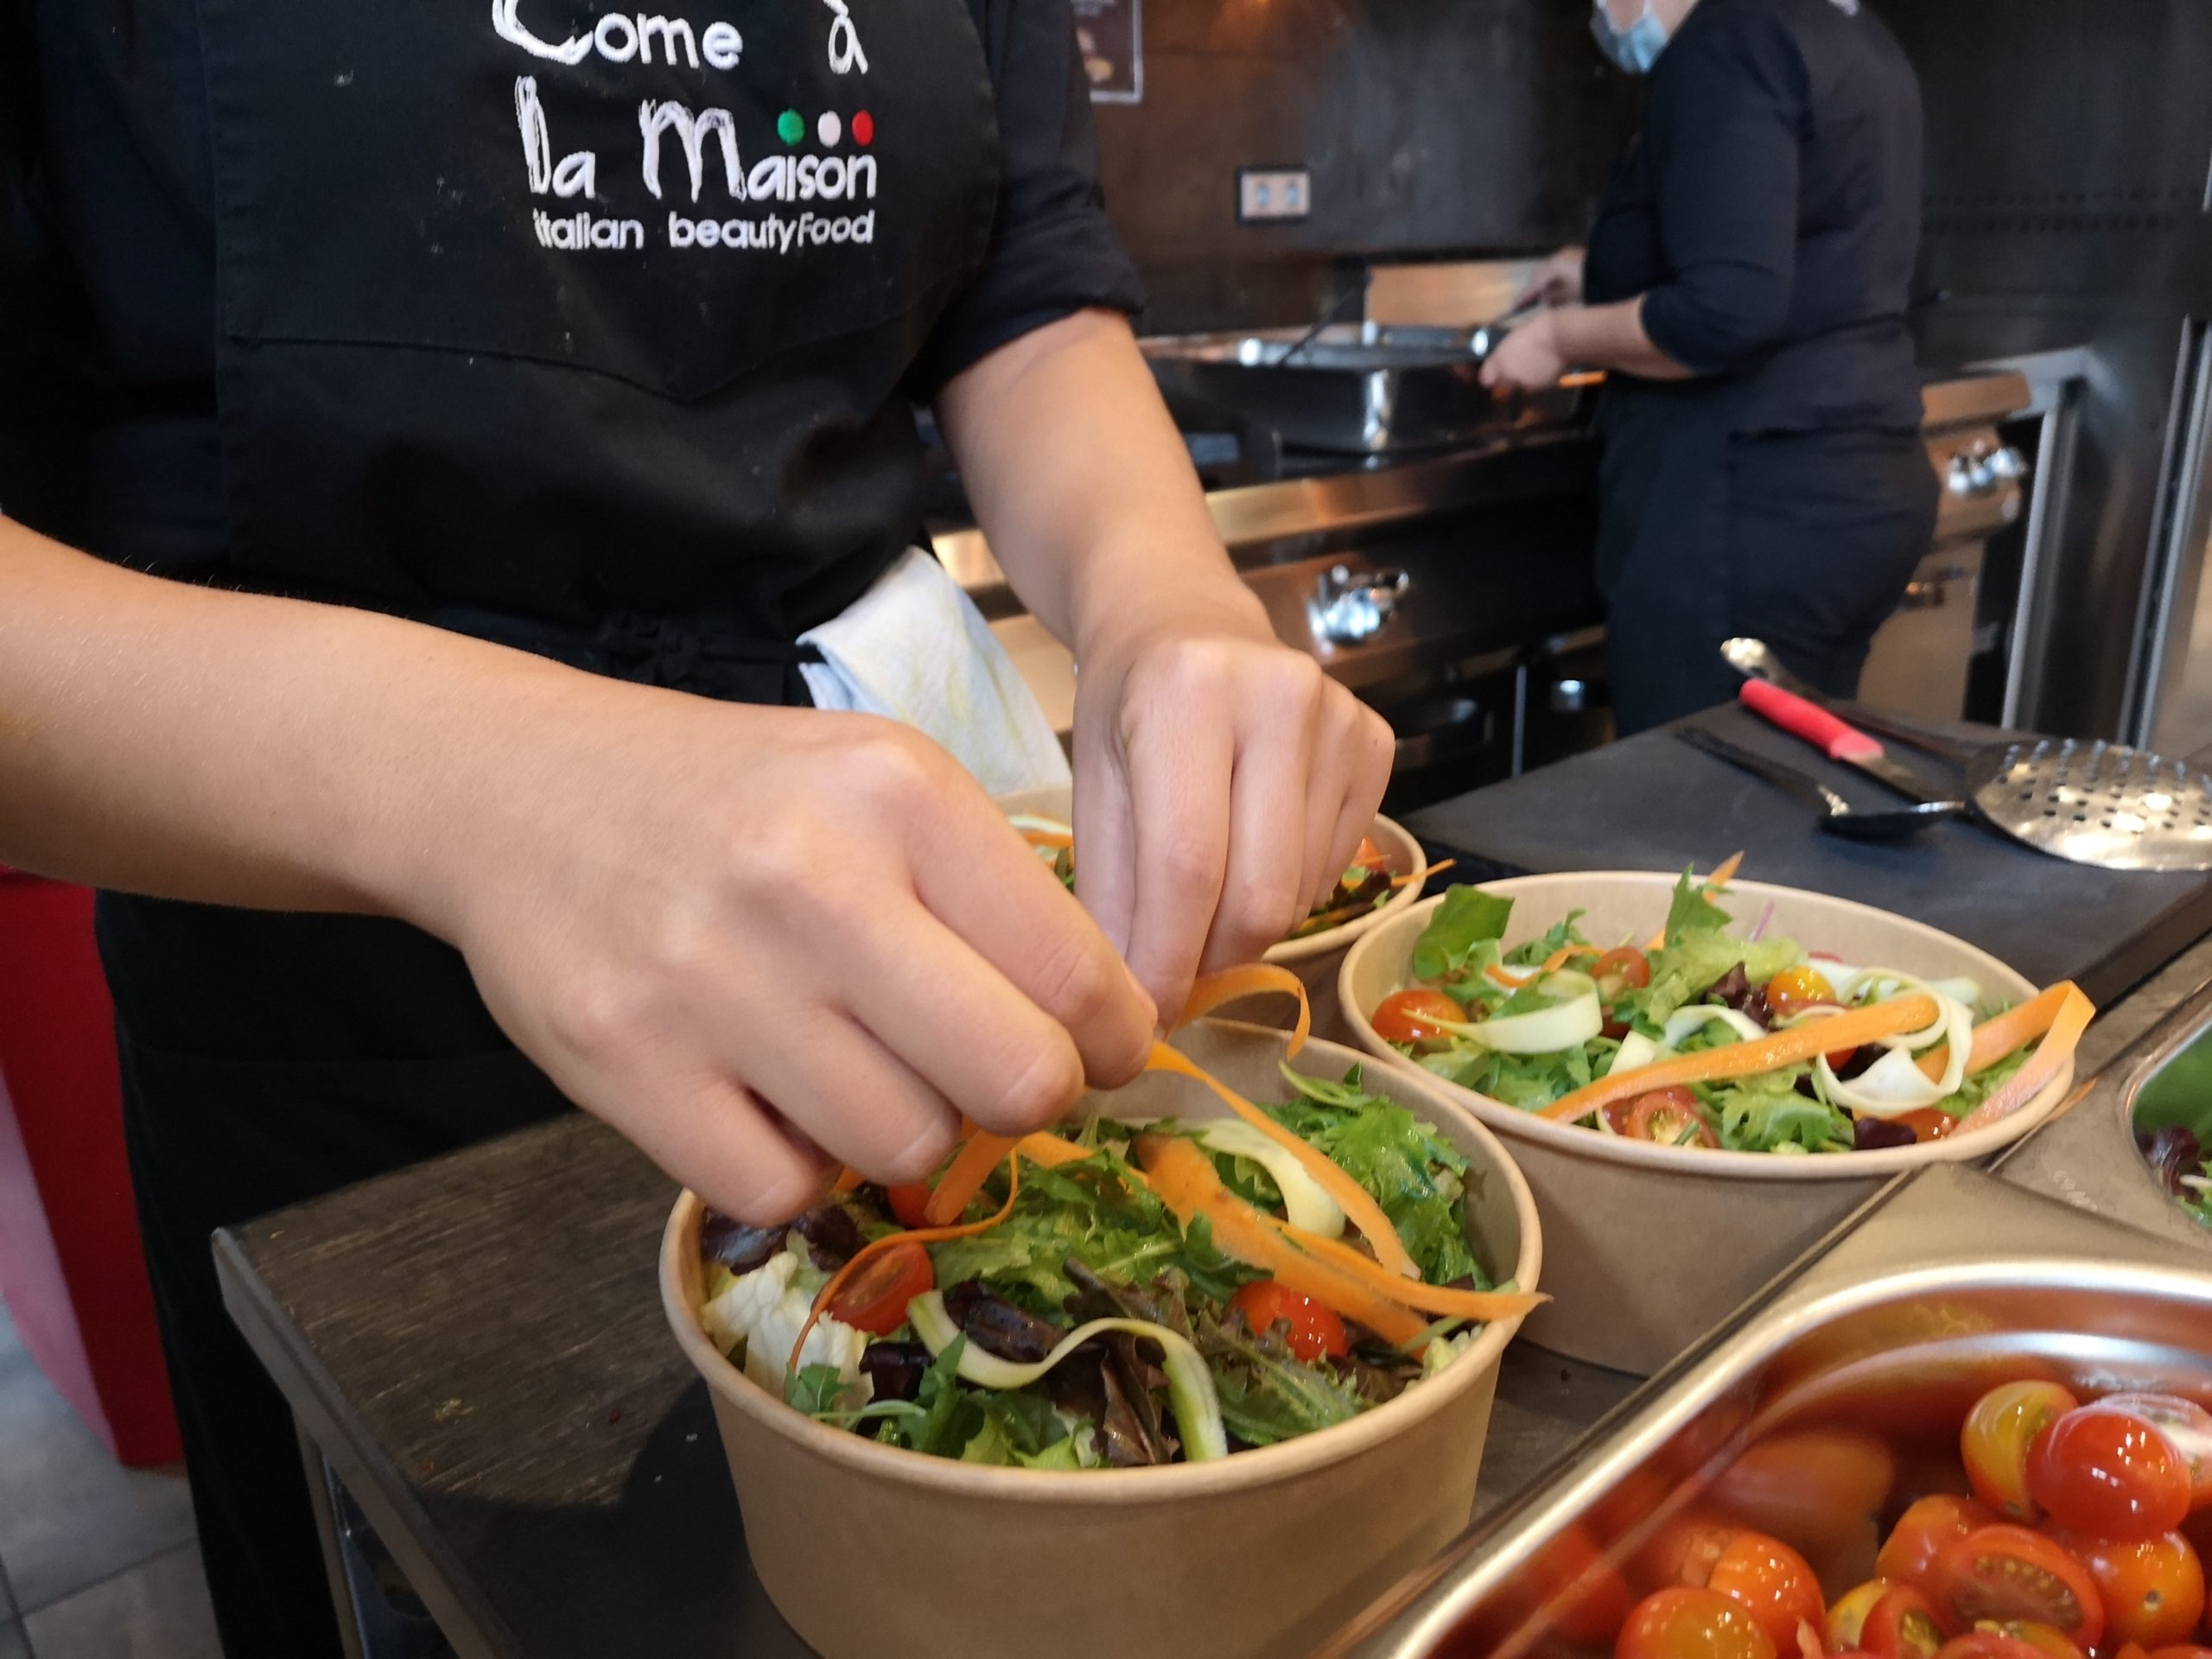 La Focacceria Restaurant Traiteur Delivery take Away Luxembourg Come a la Maison 11